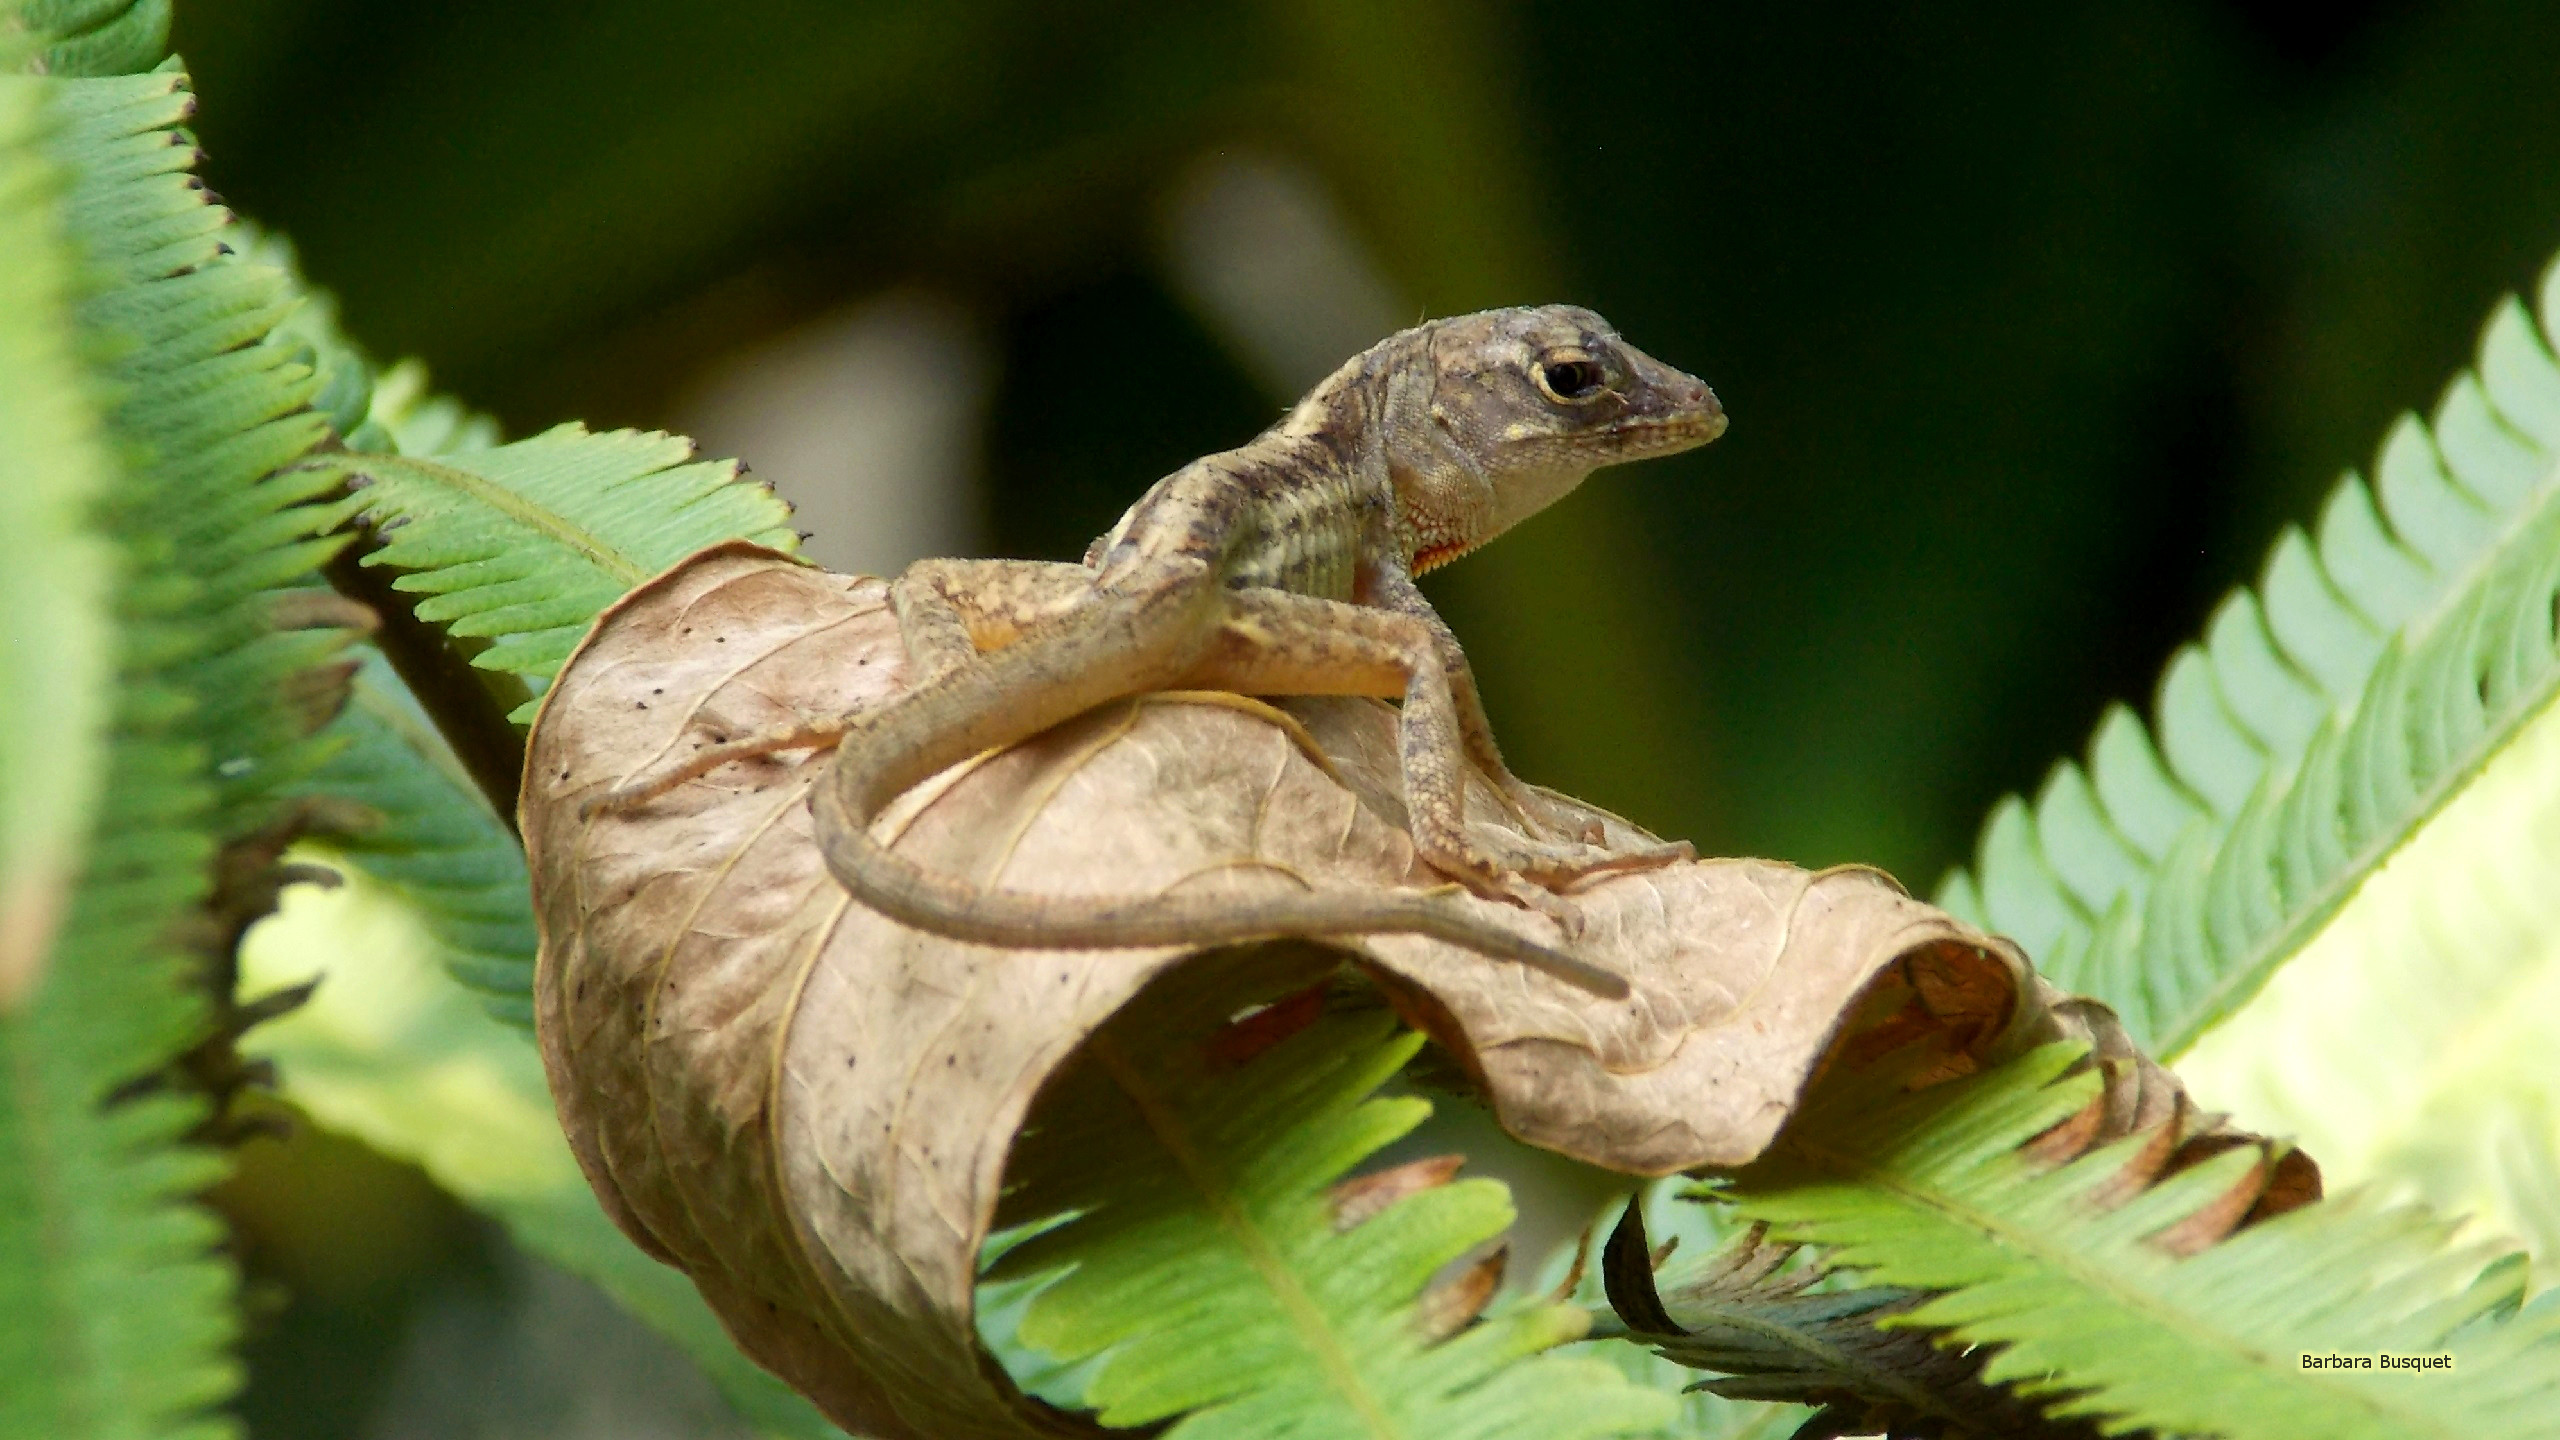 Madagascar day gecko   Barbaras HD Wallpapers 2560x1440